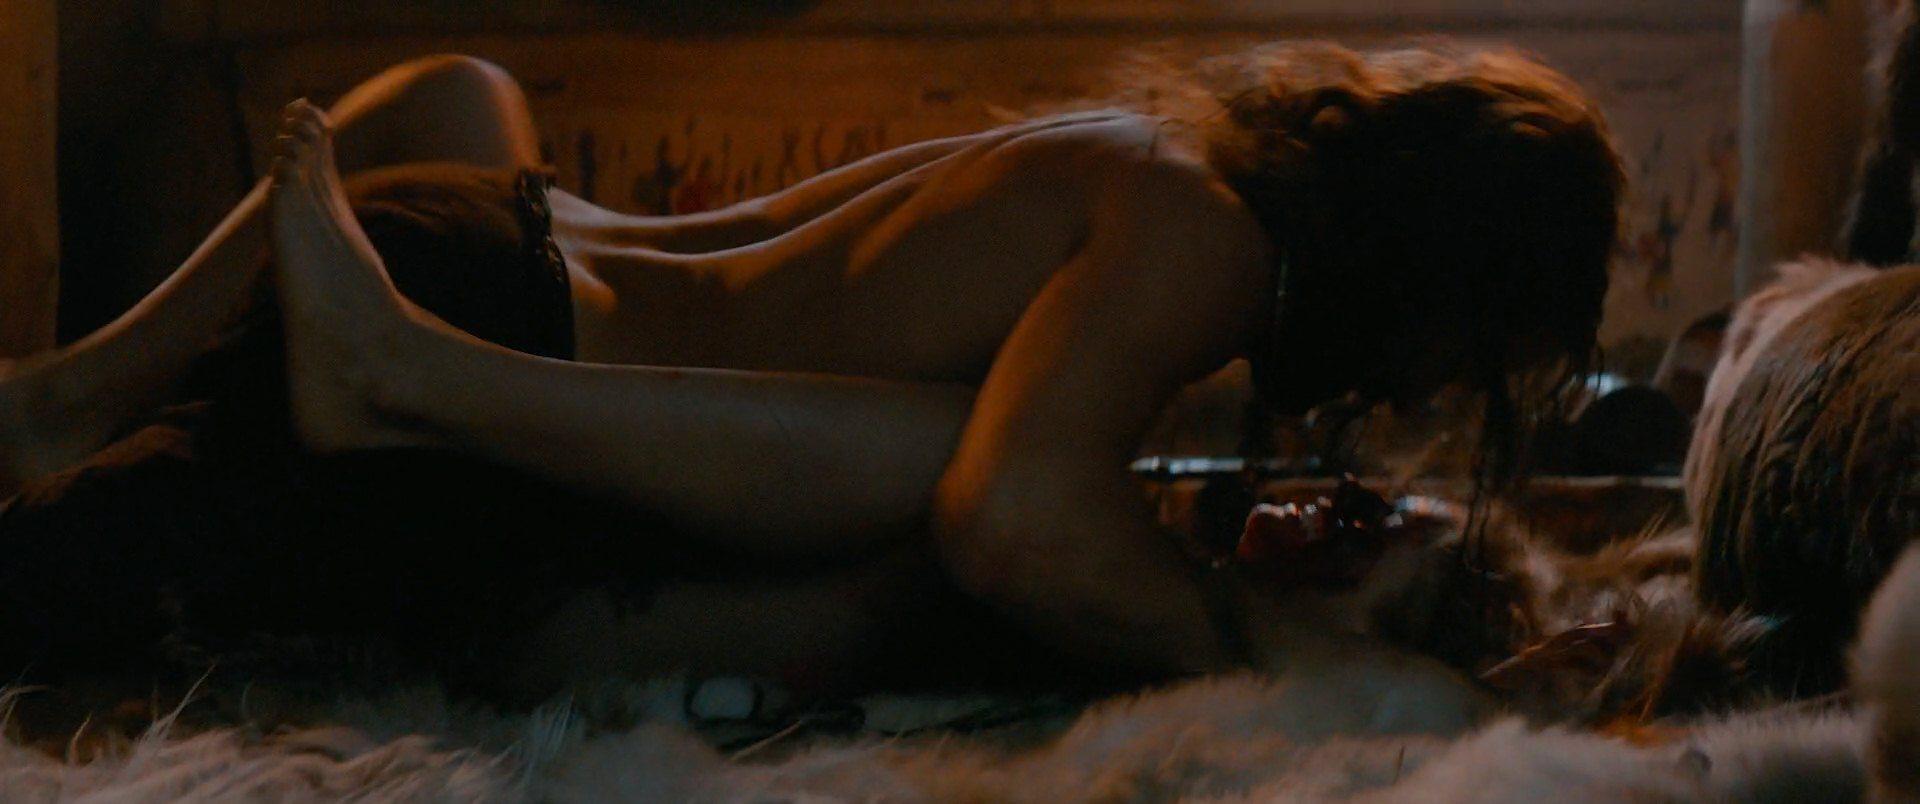 aleksandra-bortich-seksi